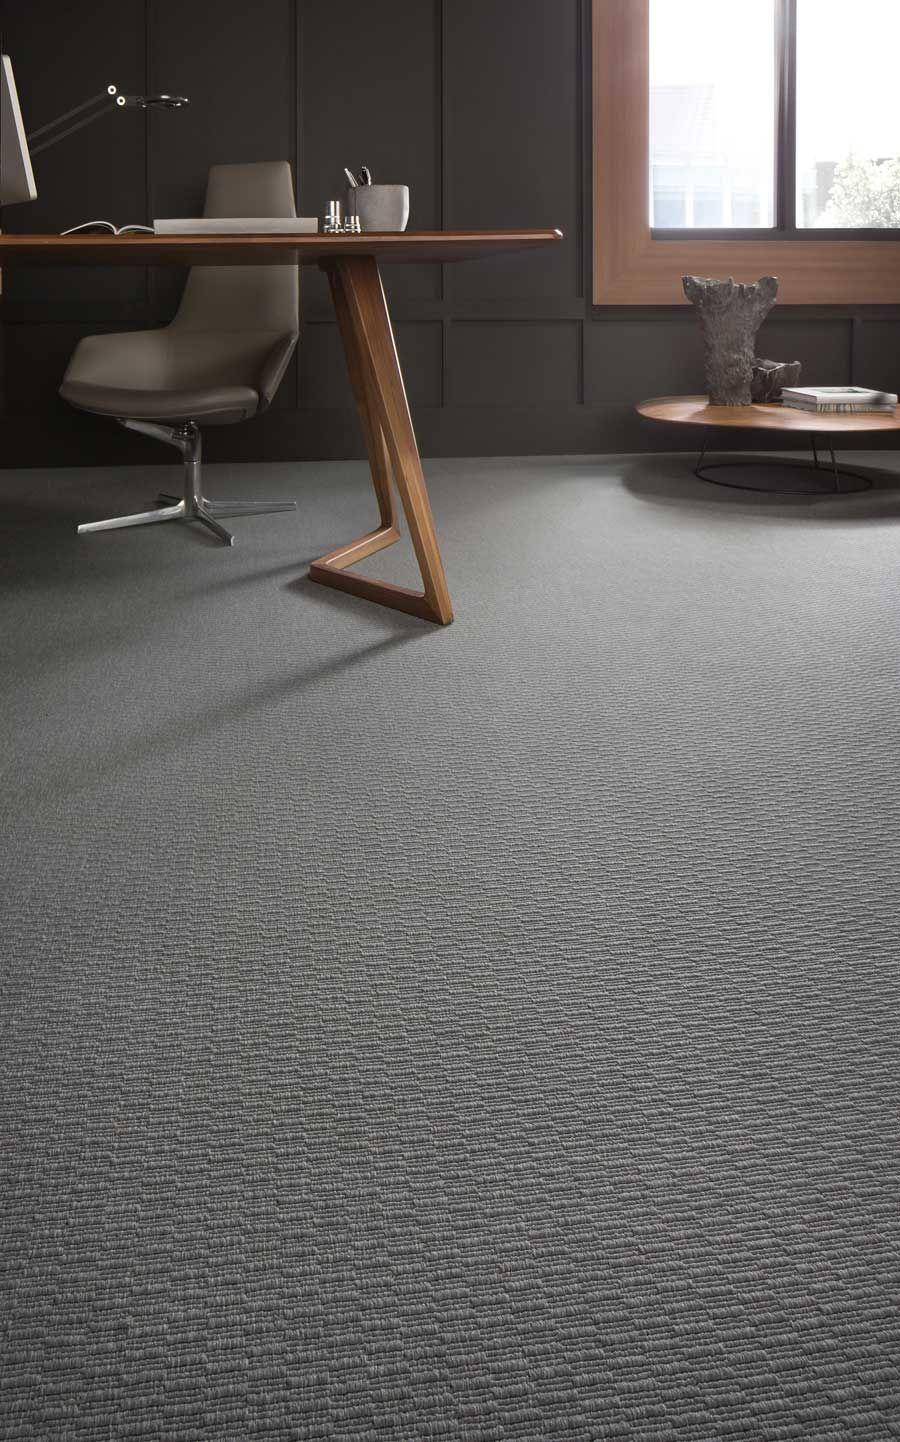 Uncommon Thread Karastan Commercial Woven Carpet Mohawk